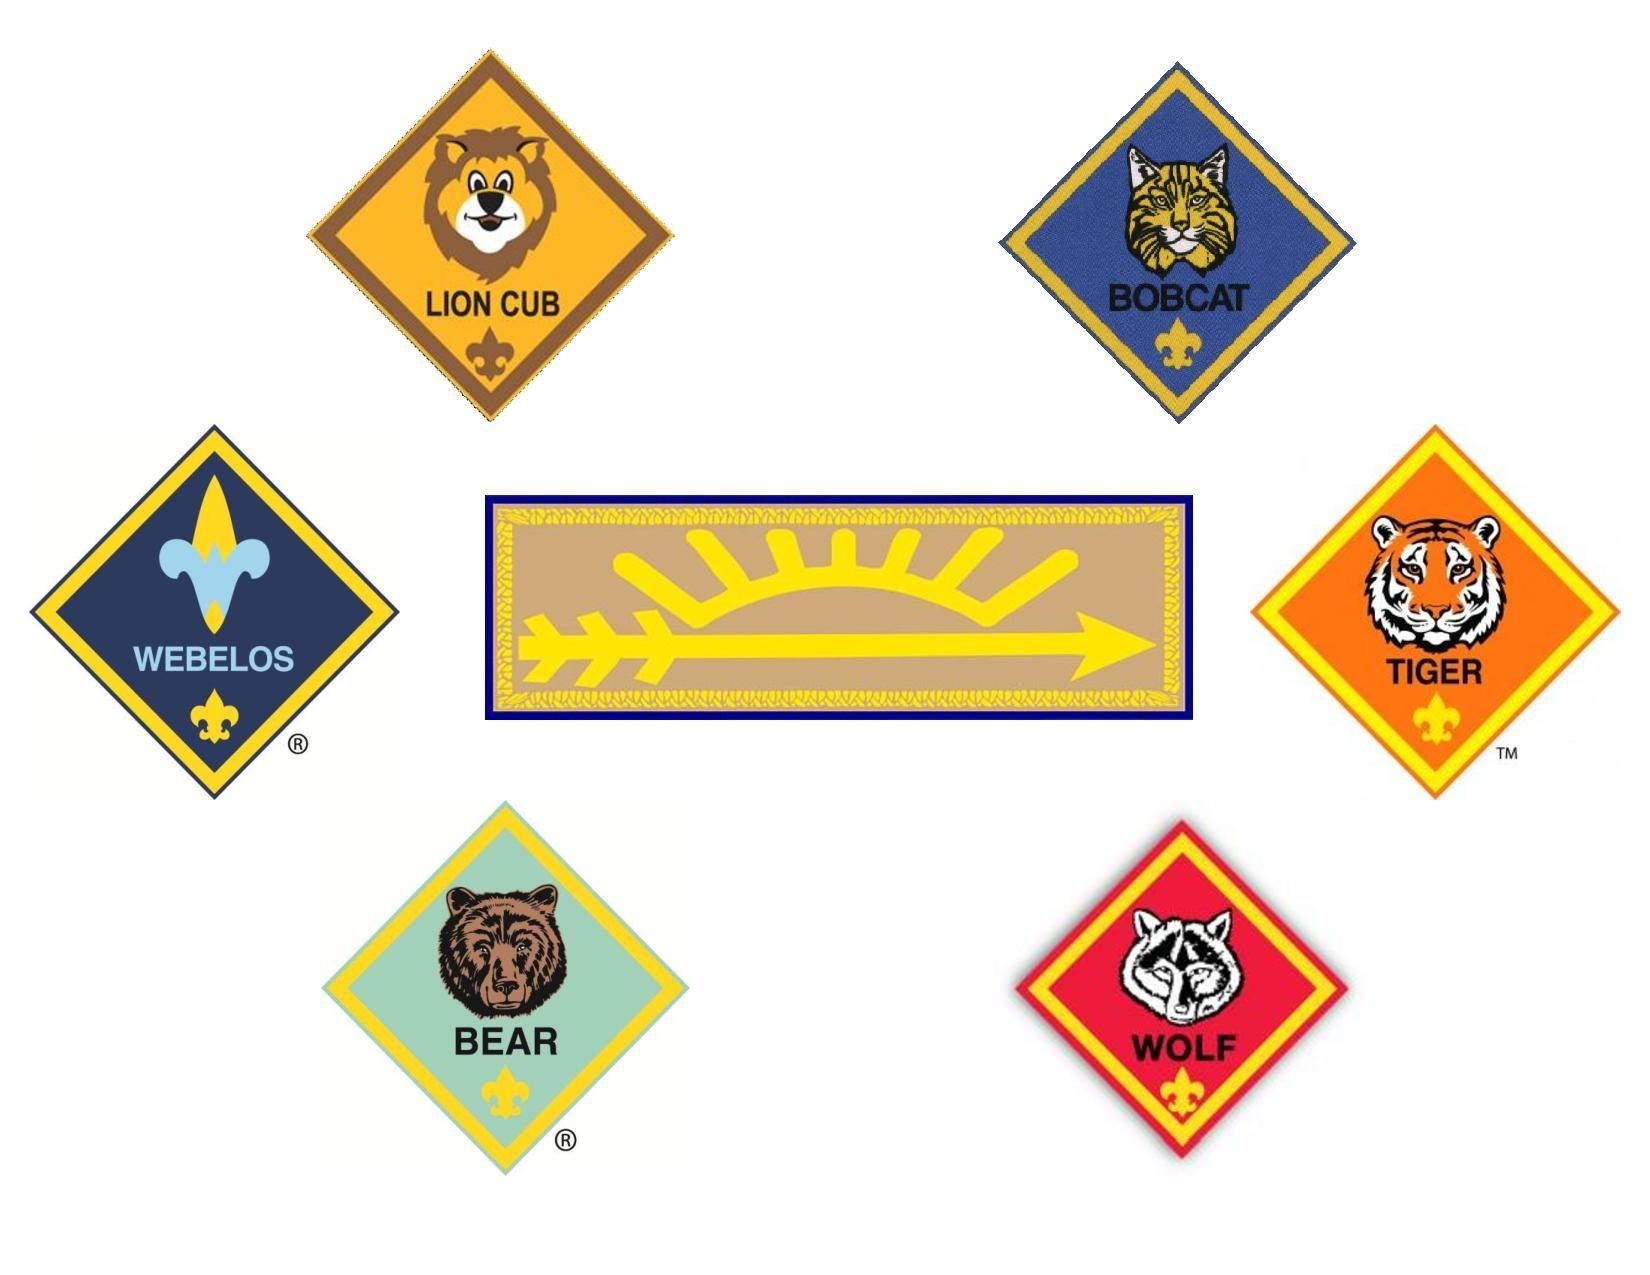 Webelos insignia clipart jpg freeuse Path to Arrow of Light: Lion, Bobcat, Tiger, Wolf, Bear, Webelos ... jpg freeuse